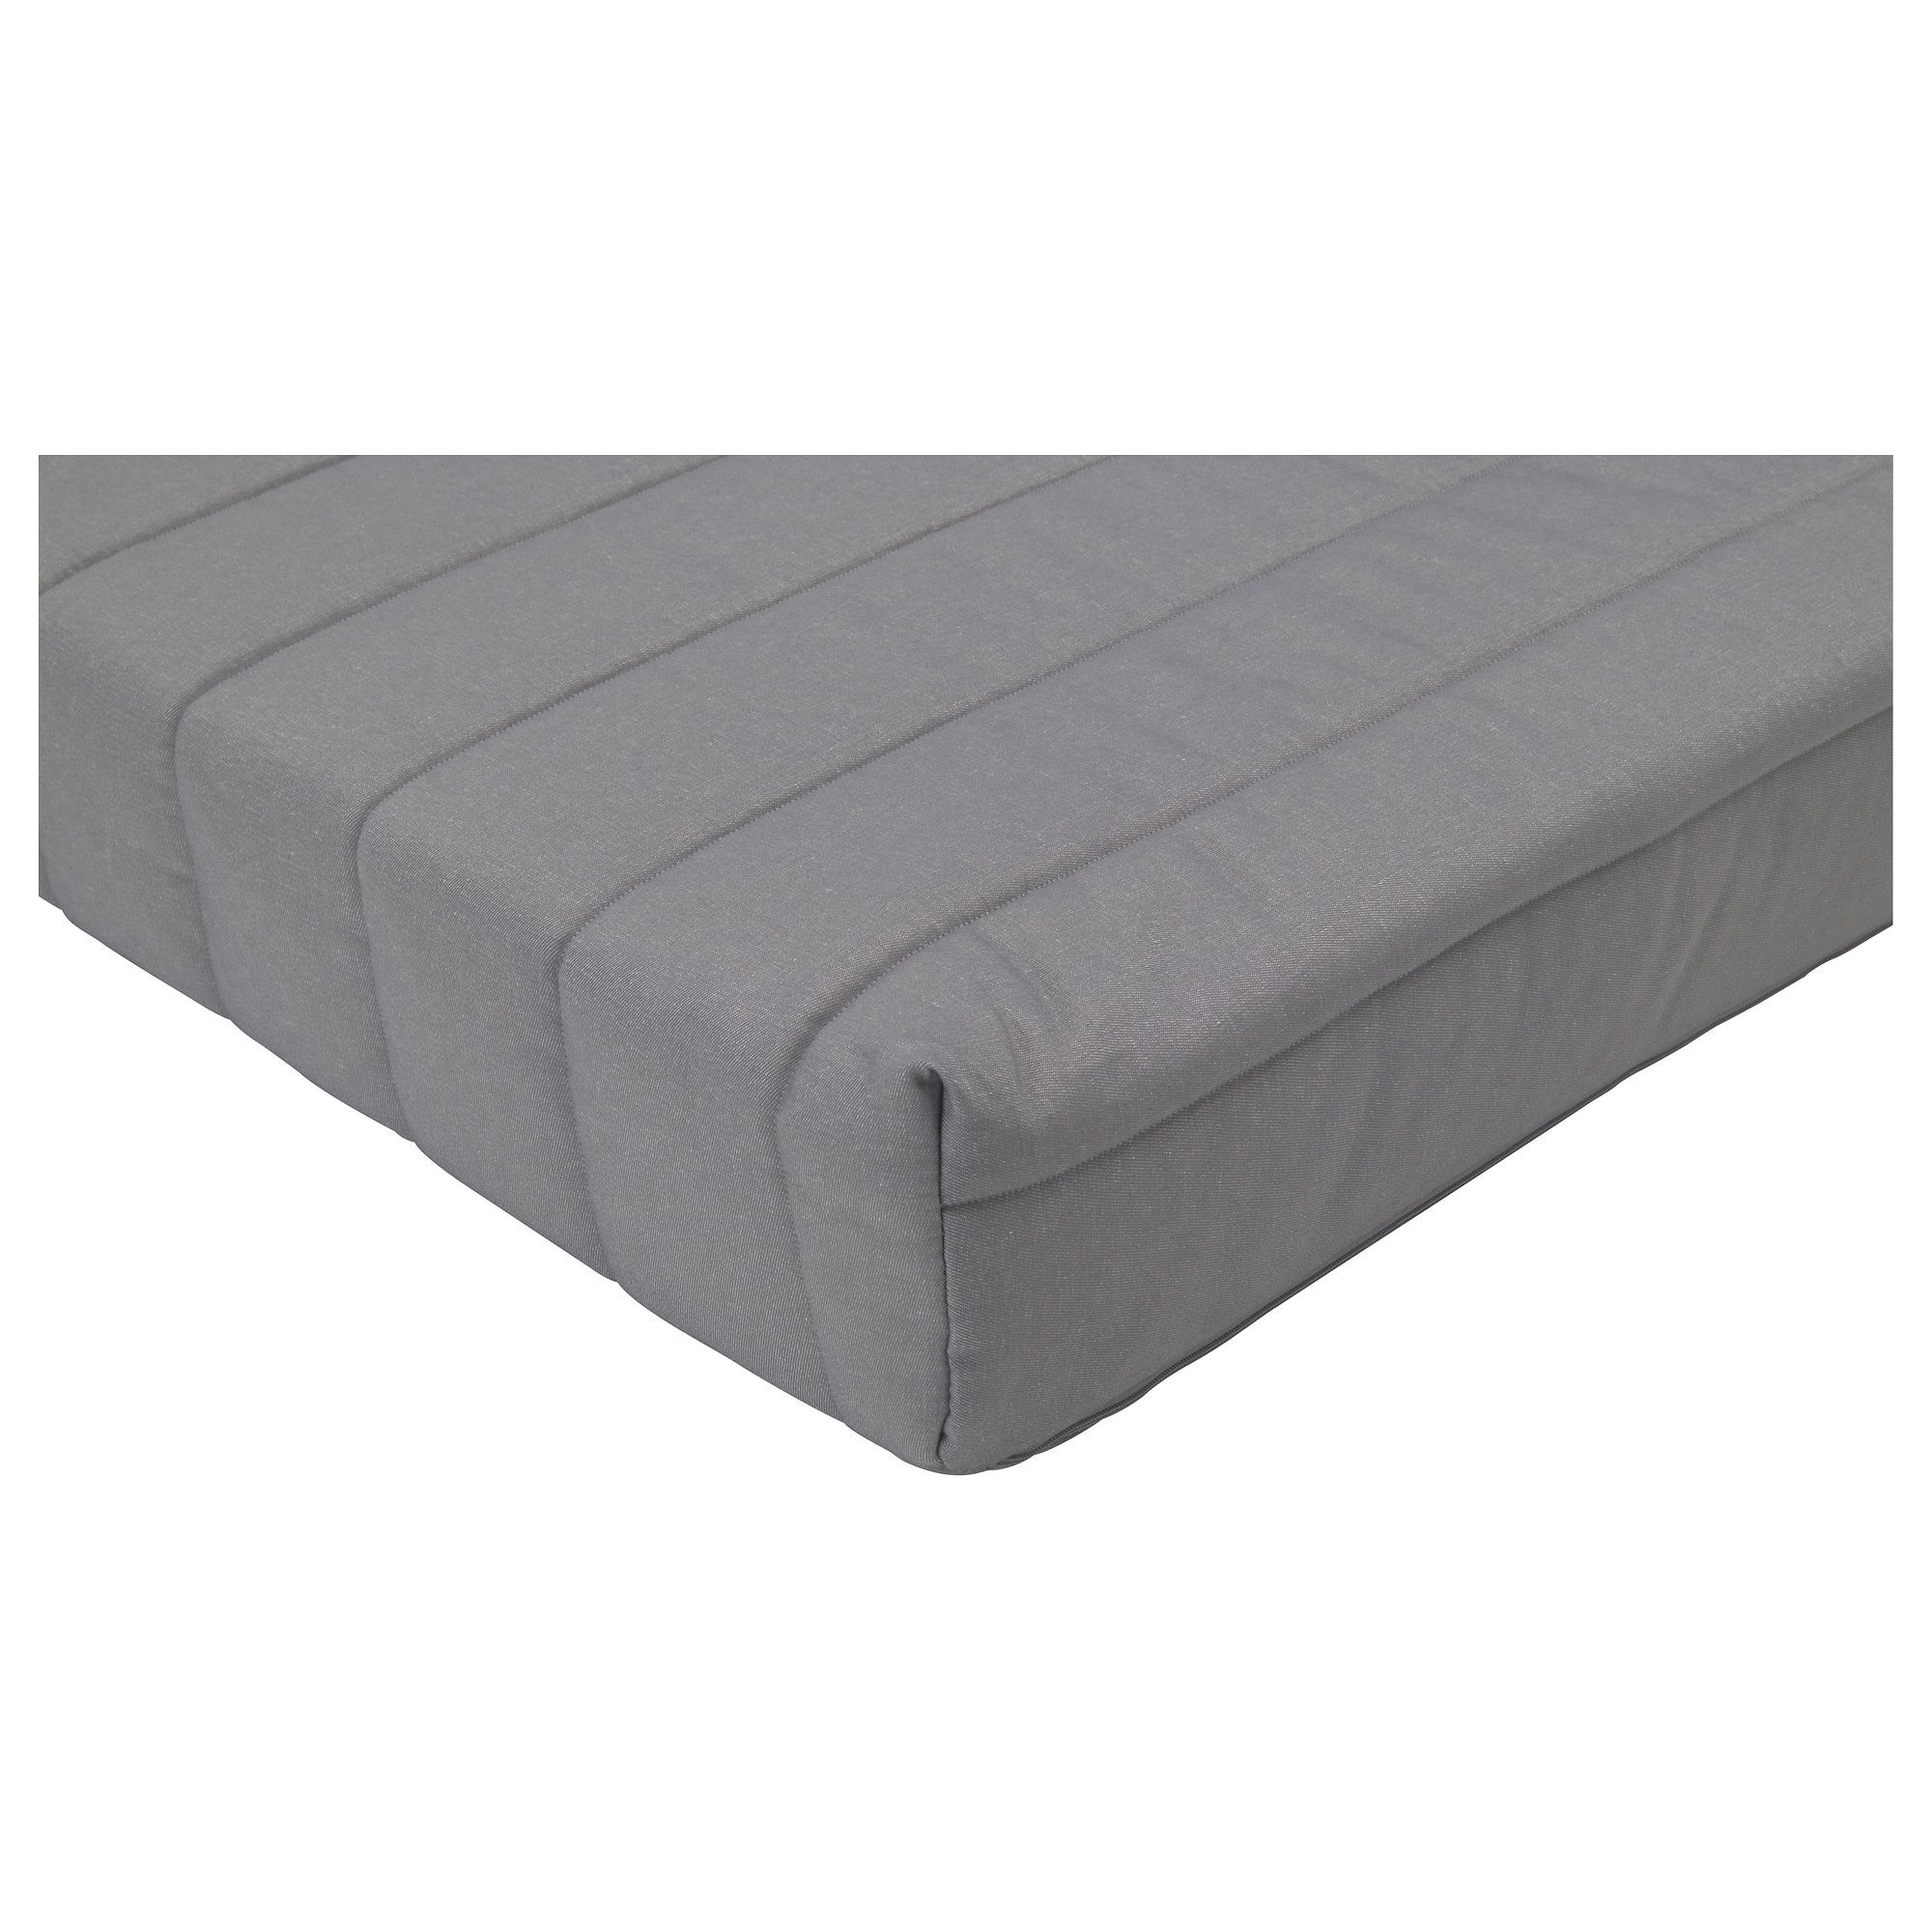 ps sofa bed review blue velvet canada beddinge lÖvÅs mattress ikea pinterest